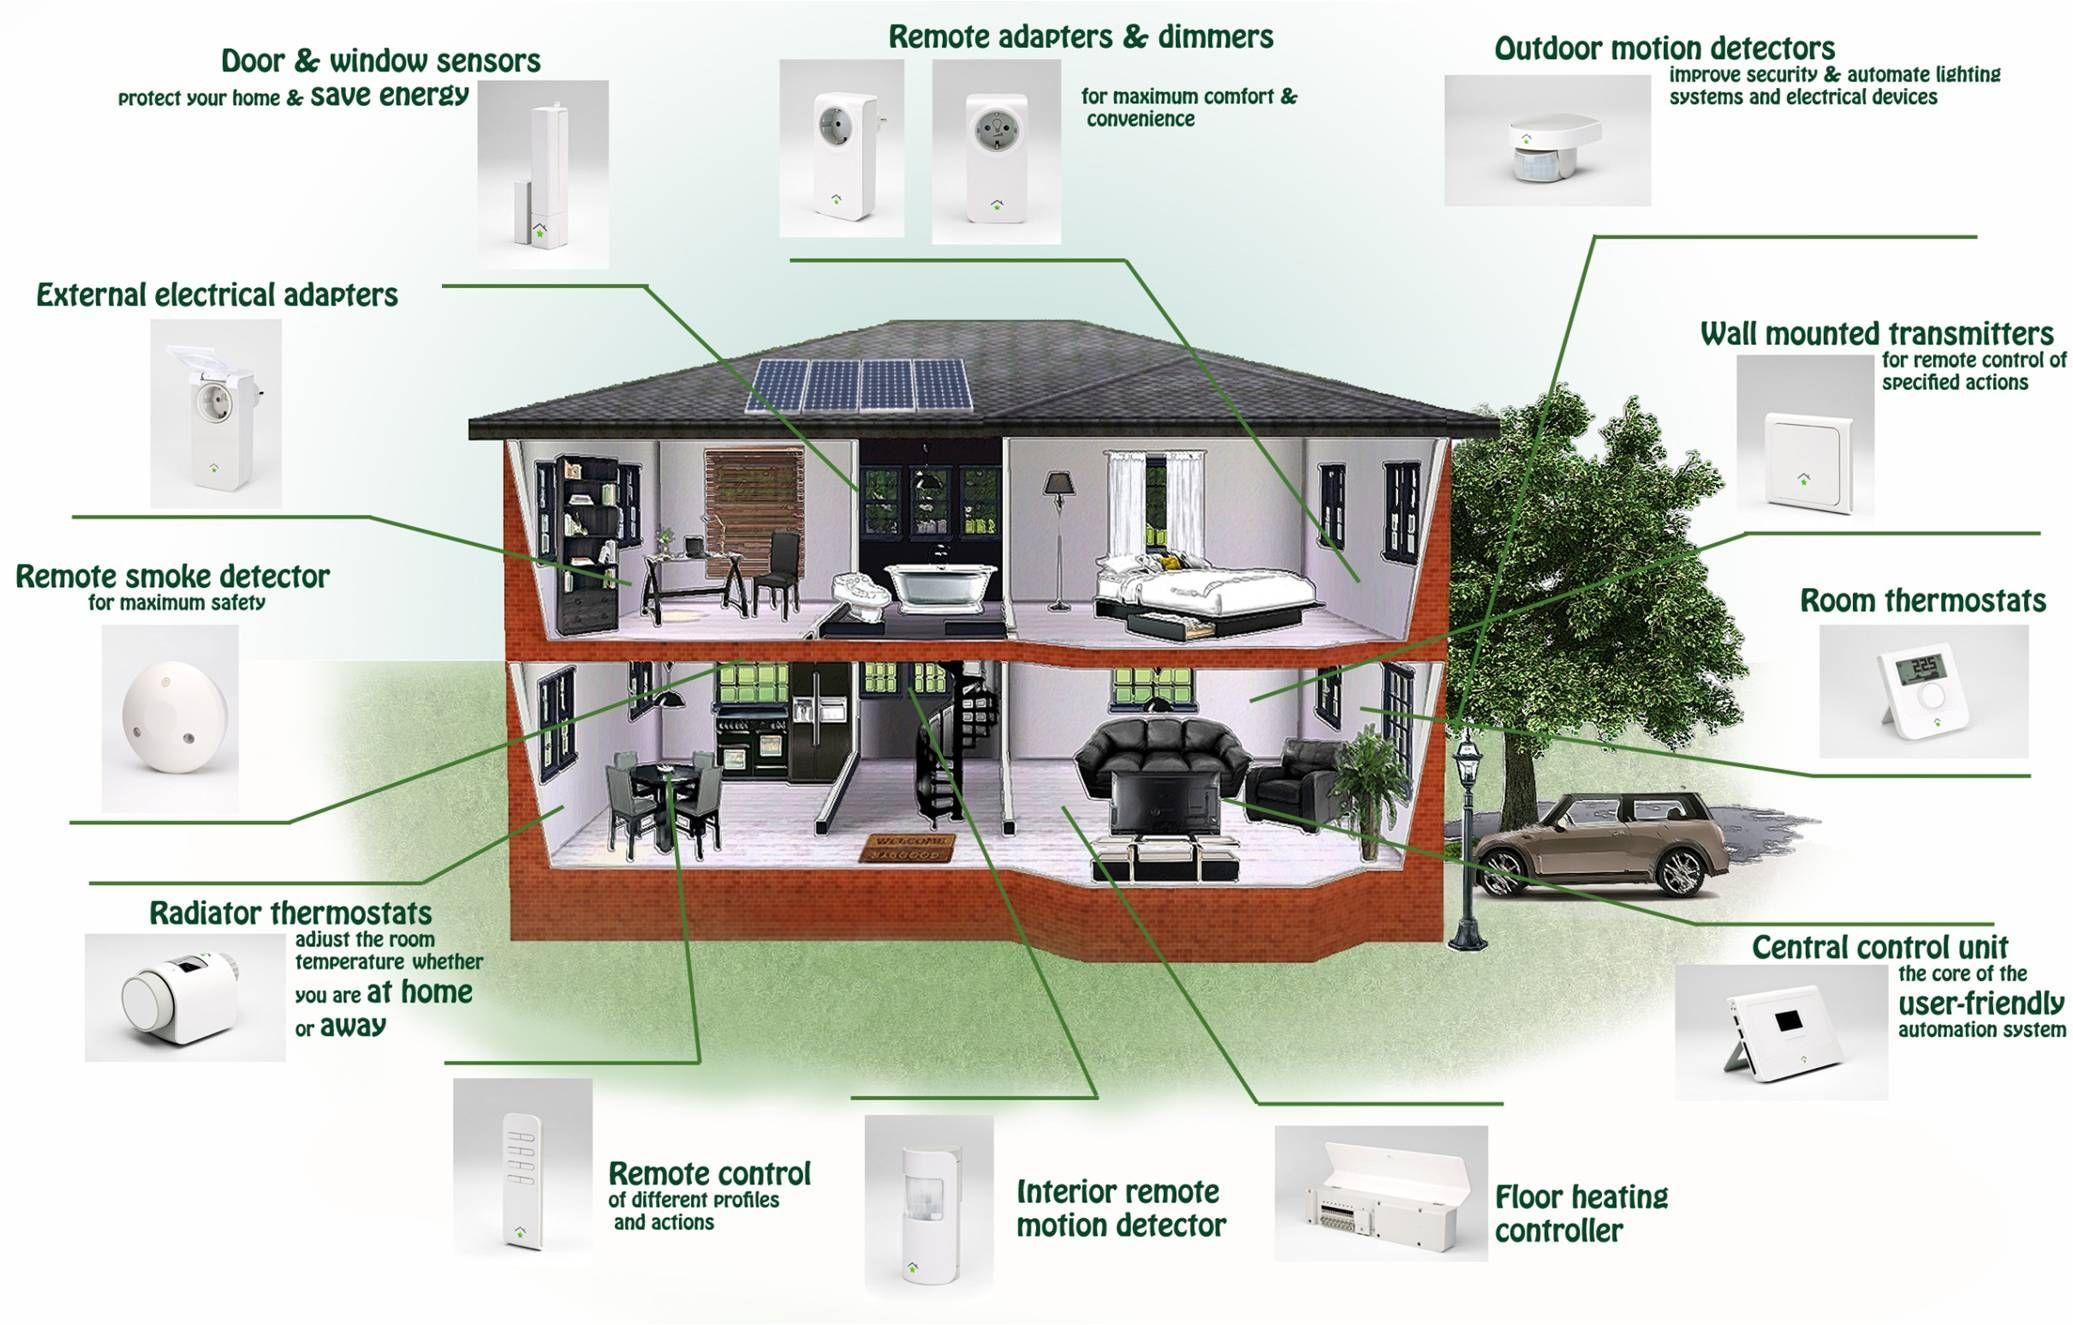 Exceptionnel Explore Smart Home Control, Smart Car, And More!